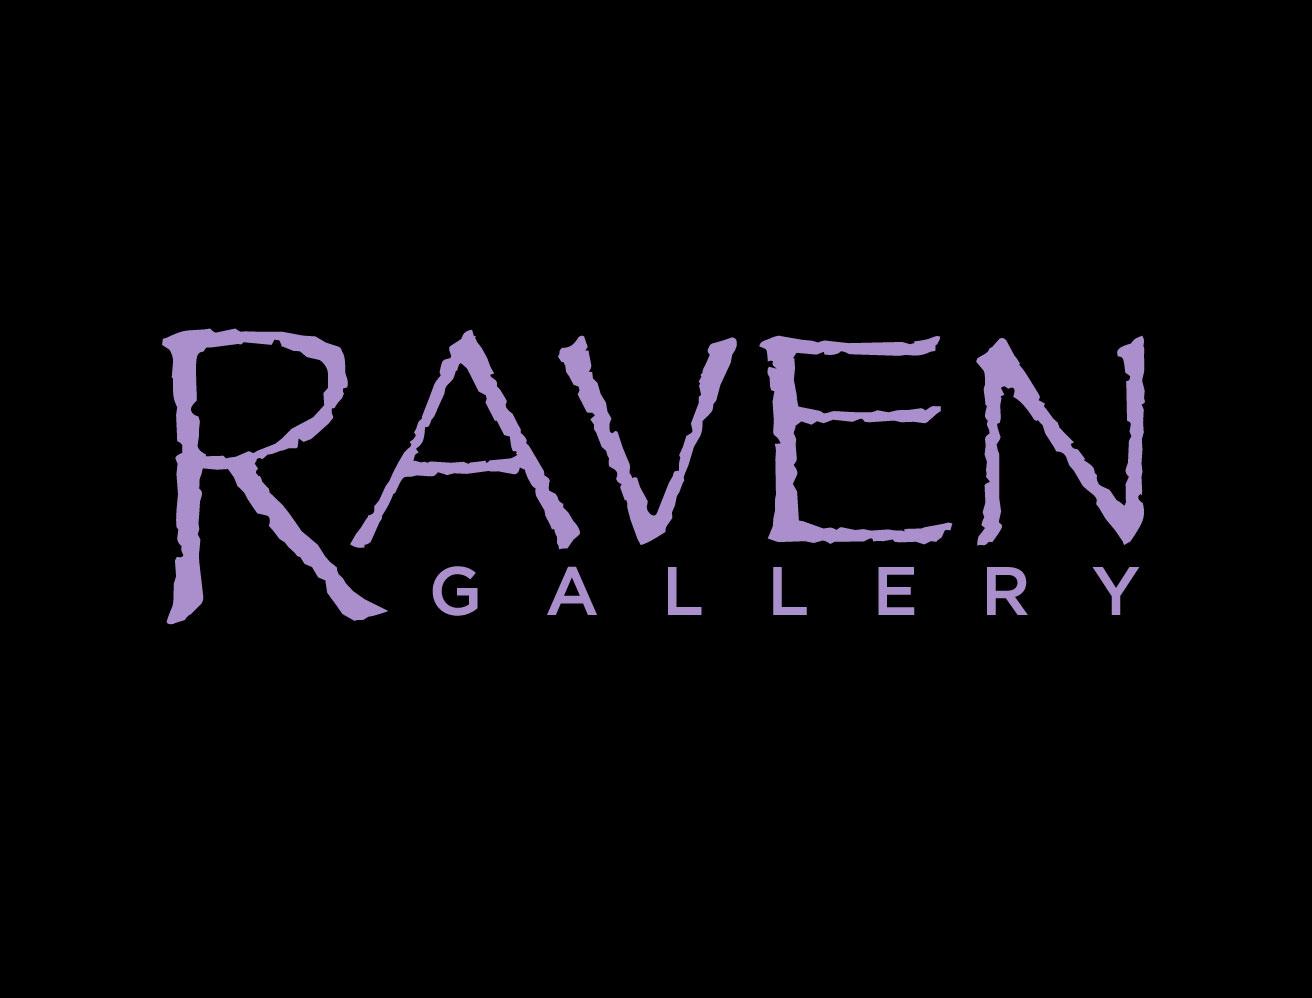 RAVEN GALLERY